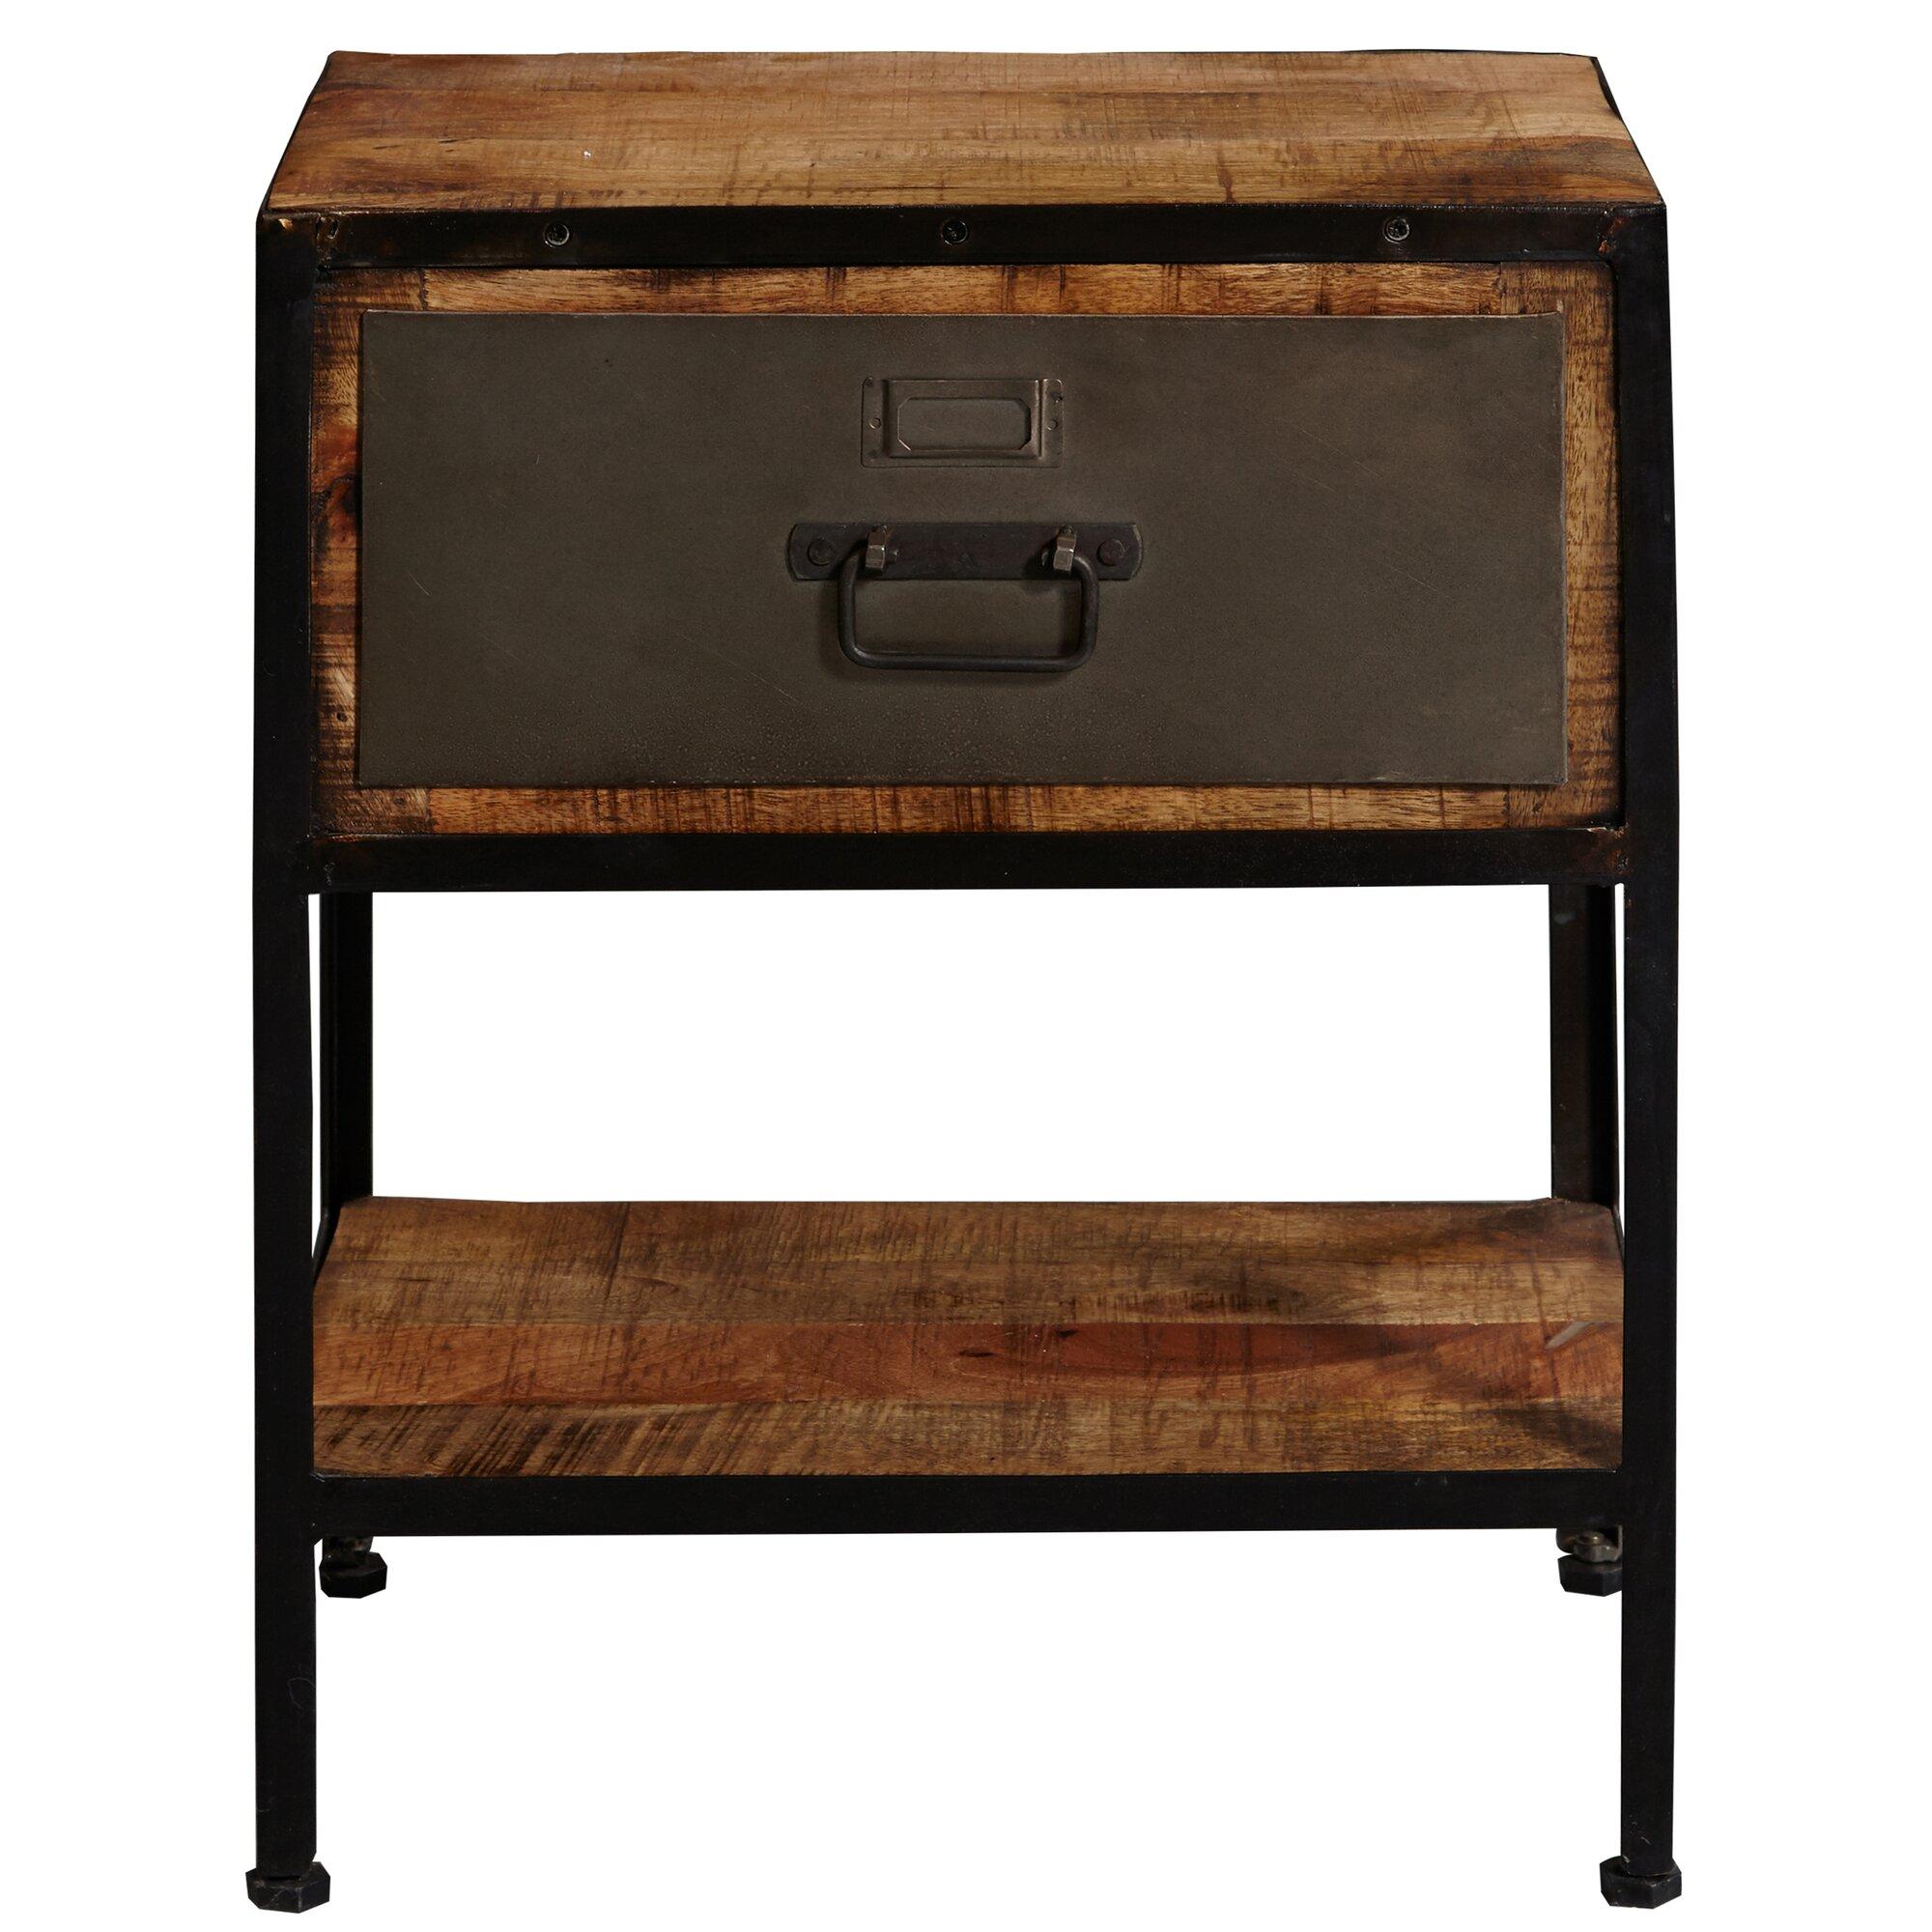 17 stories ivonne industrial metal and wood end table reviews. Black Bedroom Furniture Sets. Home Design Ideas